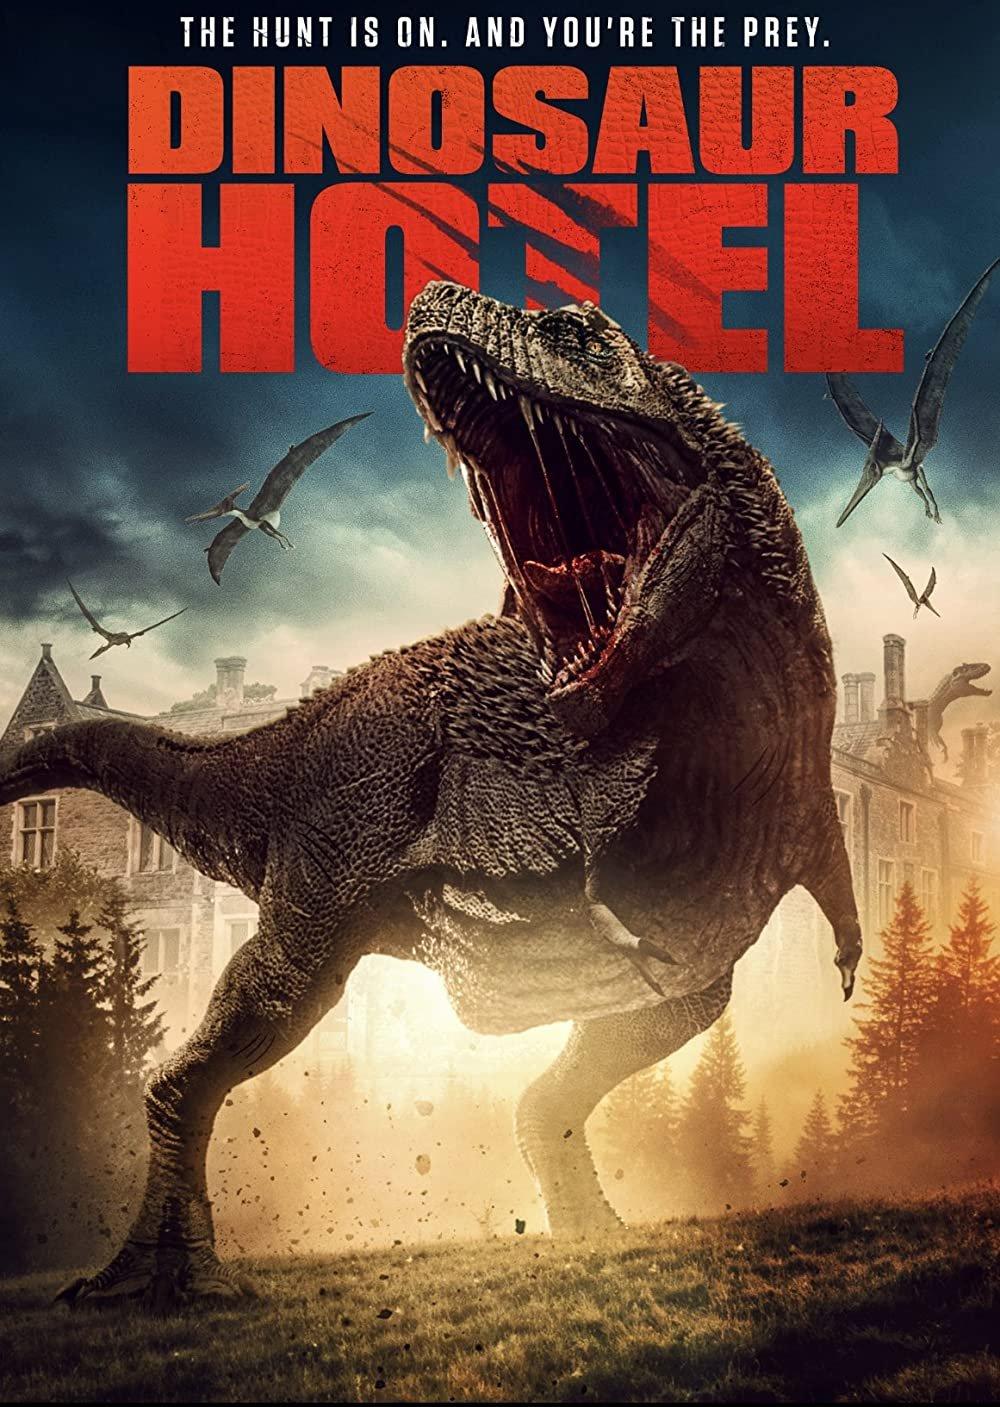 Dinosaur Hotel poster image